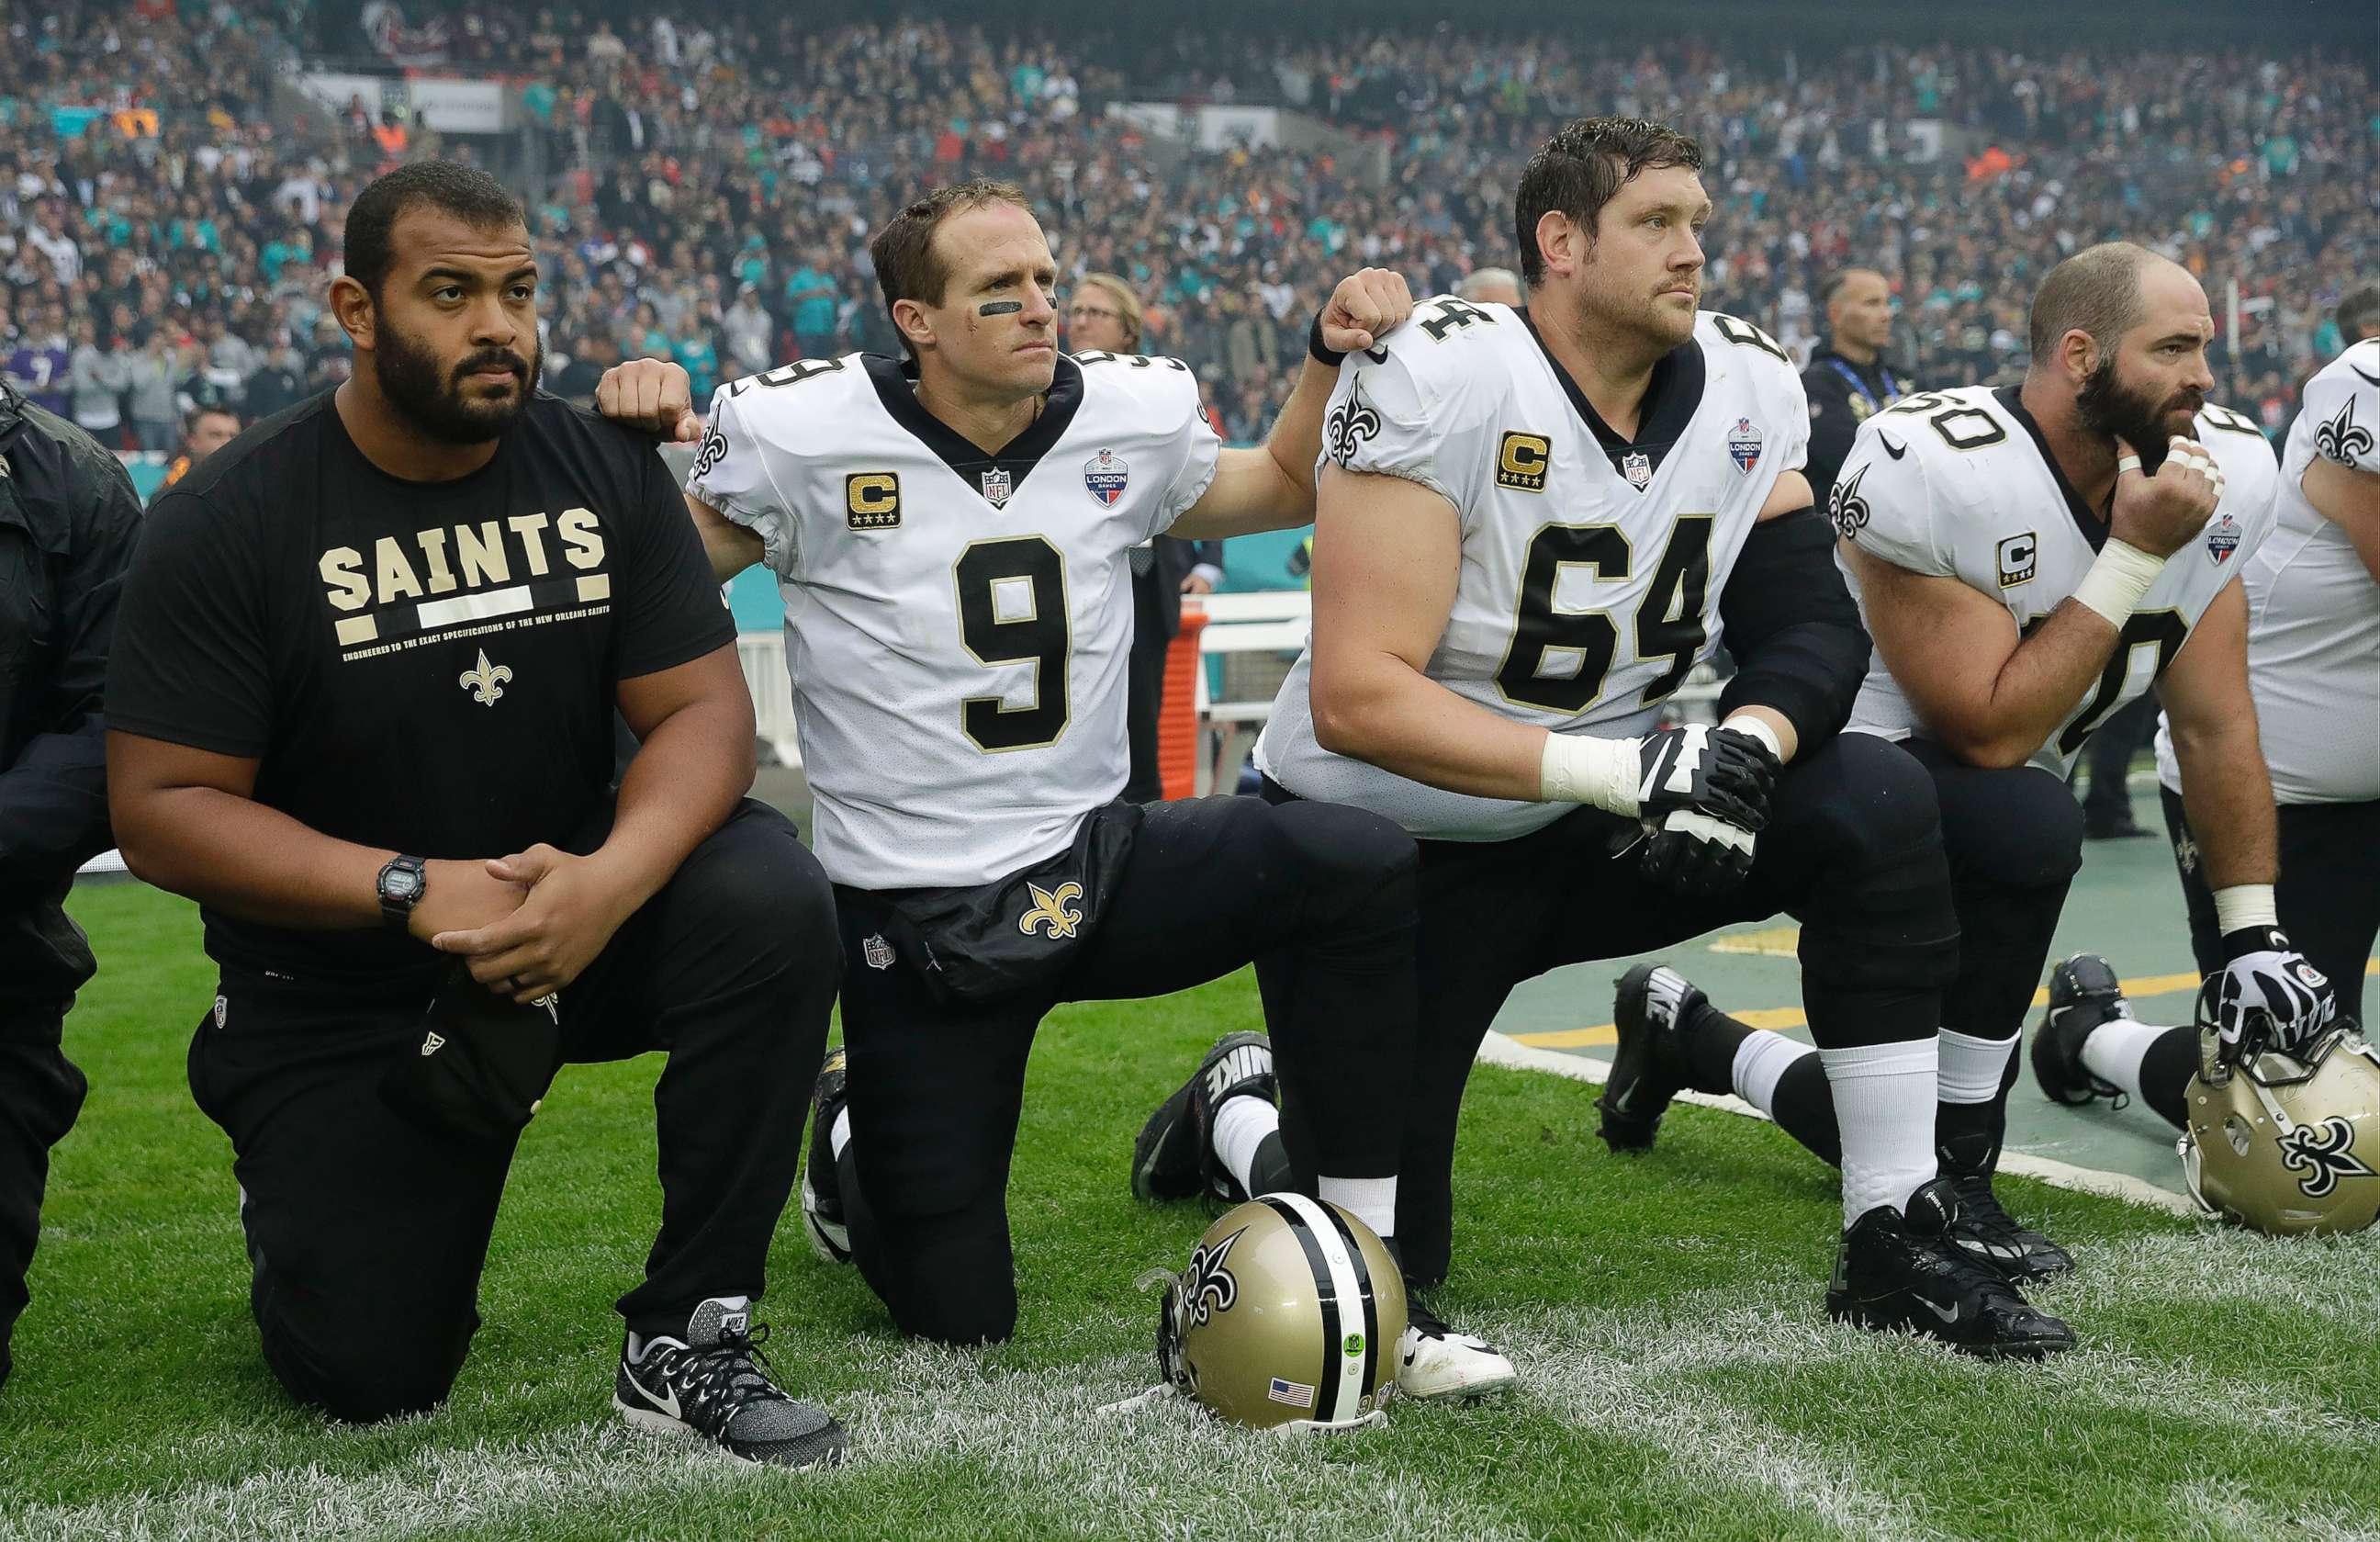 PHOTO New Orleans Saints quarterback Drew Brees 9 kneels down